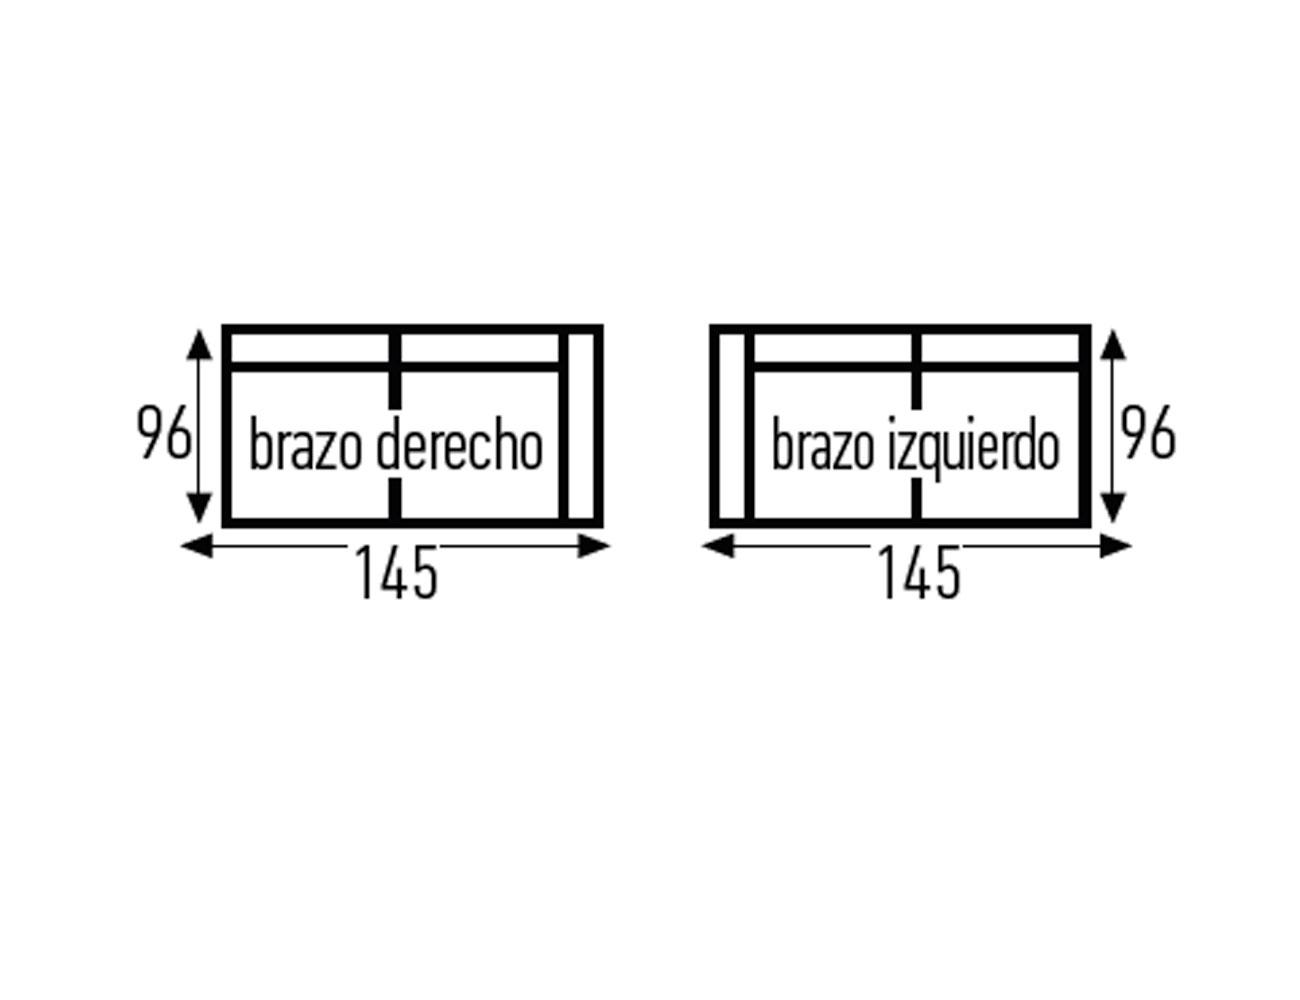 Croquis sofa sin 1 brazo 1455